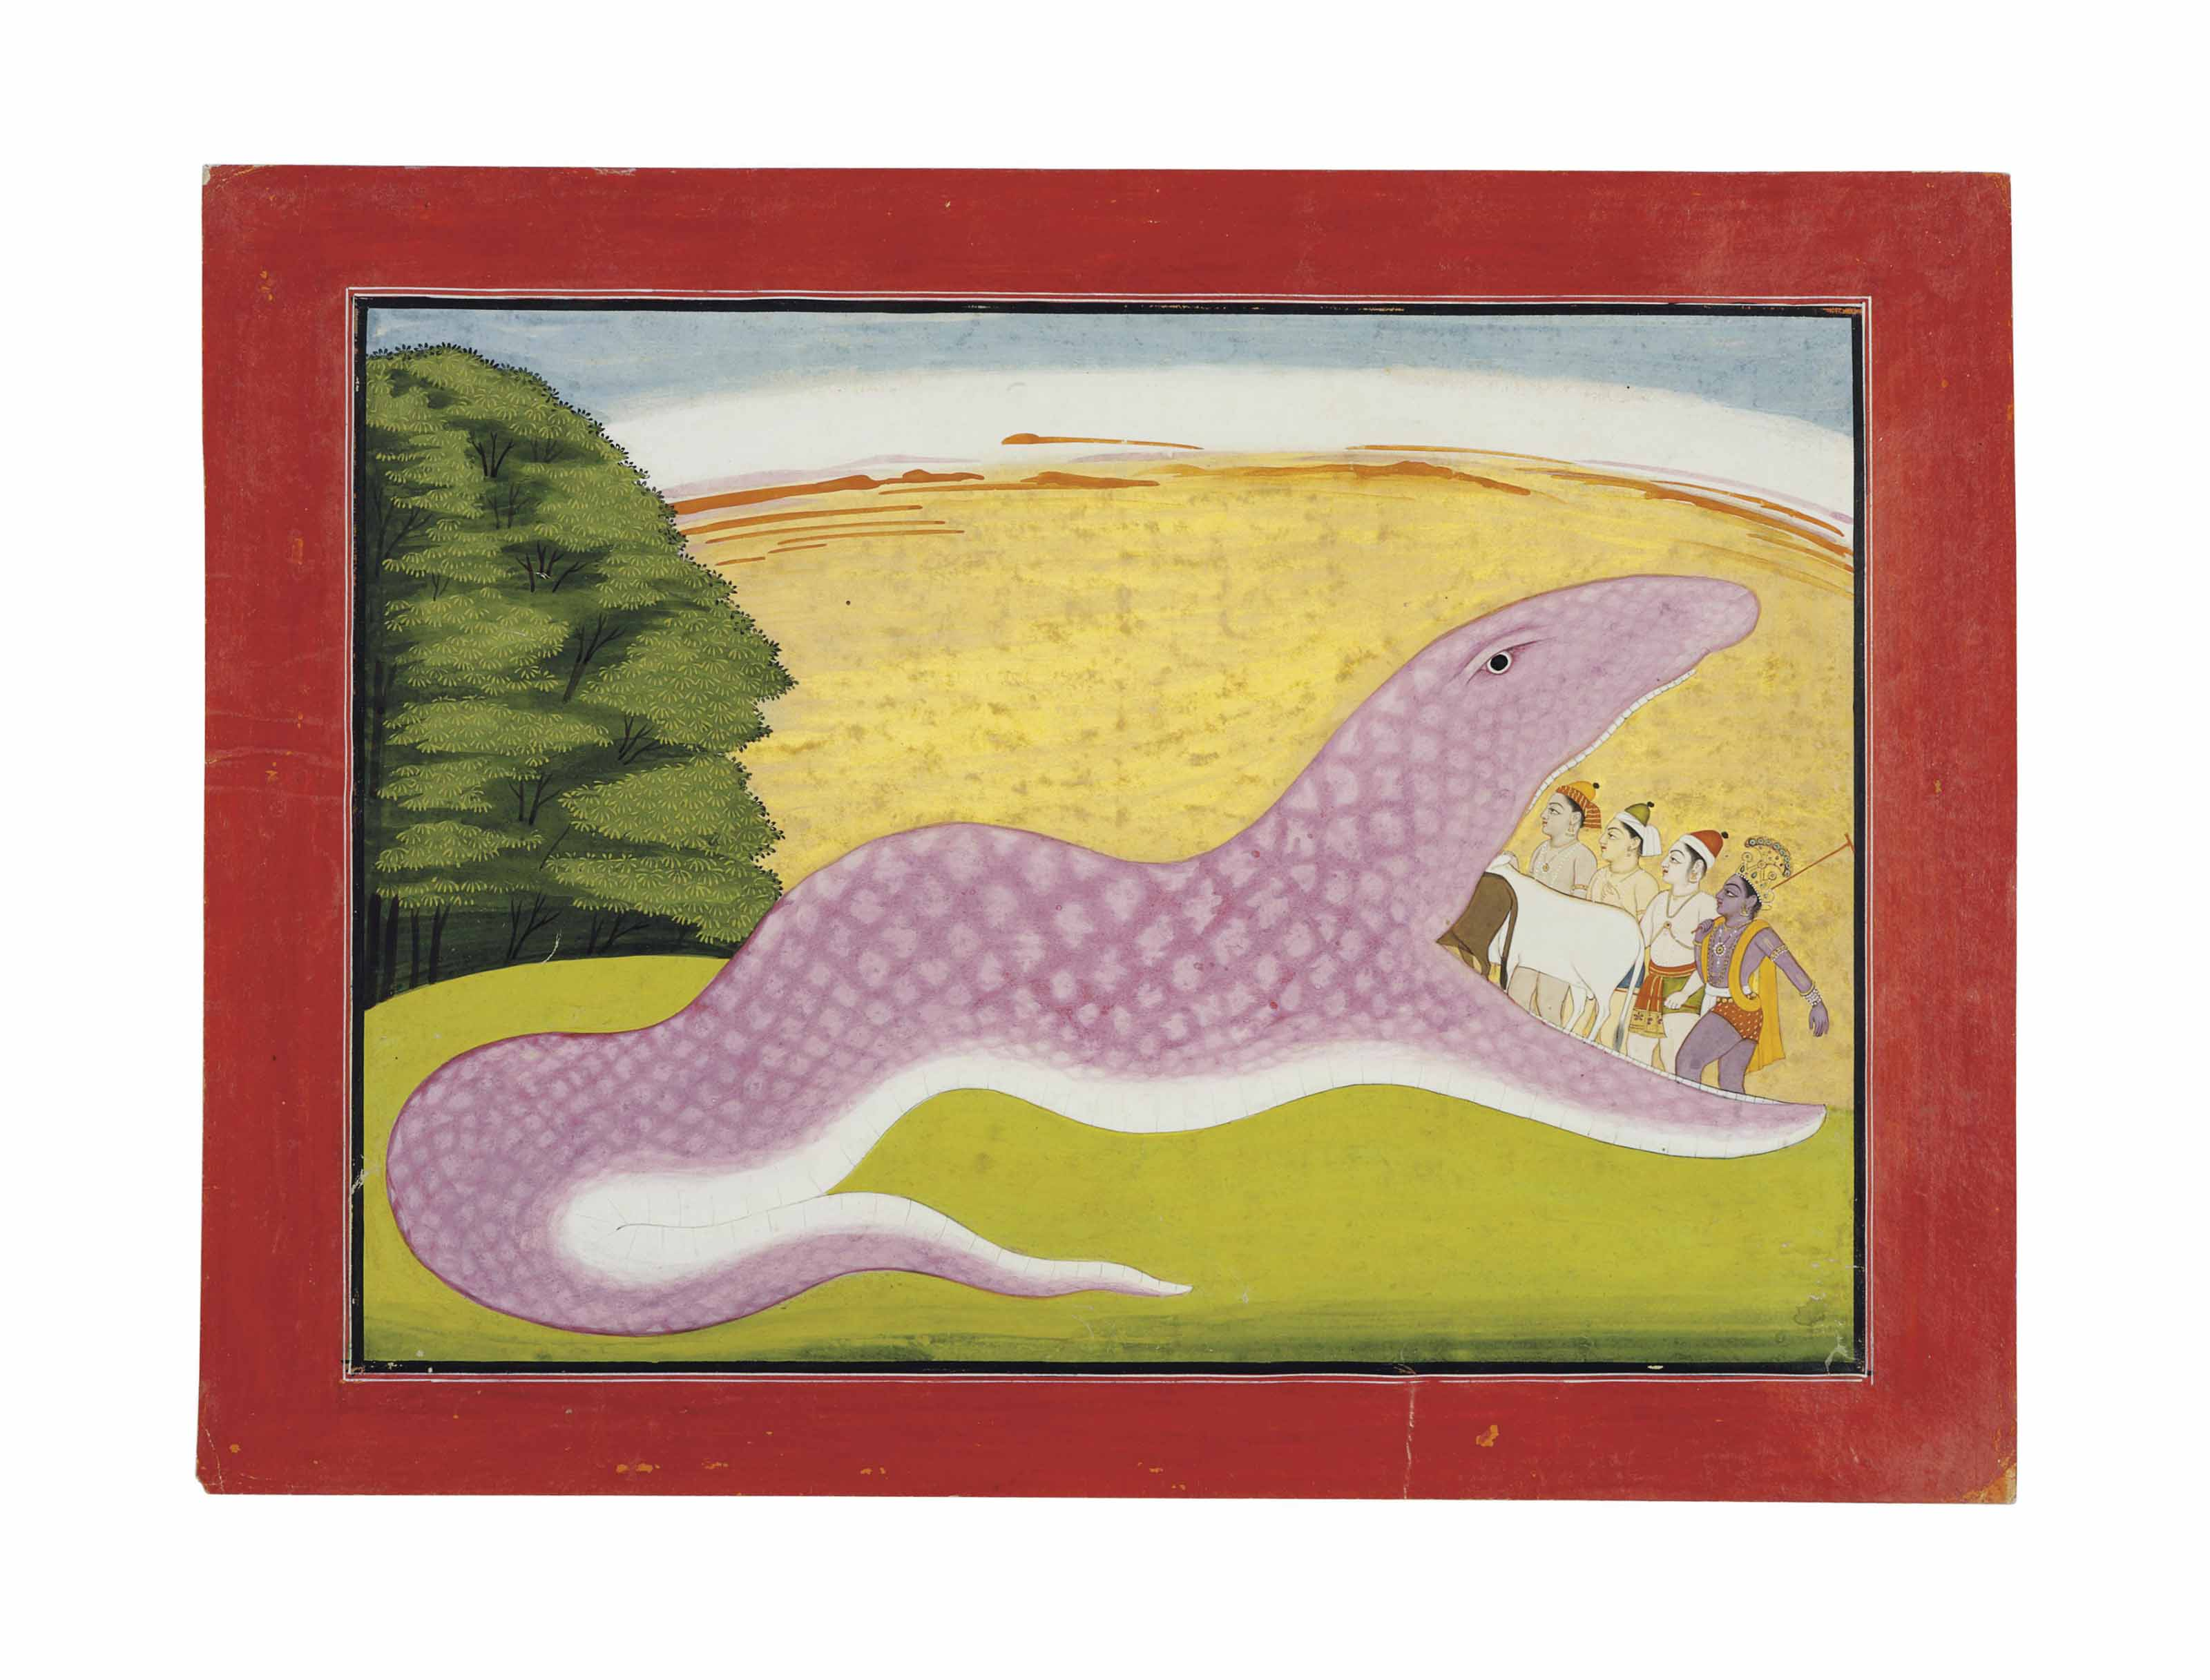 AN ILLUSTRATION TO THE BHAGAVATA PURANA: THE SNAKE DEMON UGRASURA SWALLOWING KRISHNA, THE GOPAS AND THEIR HERD